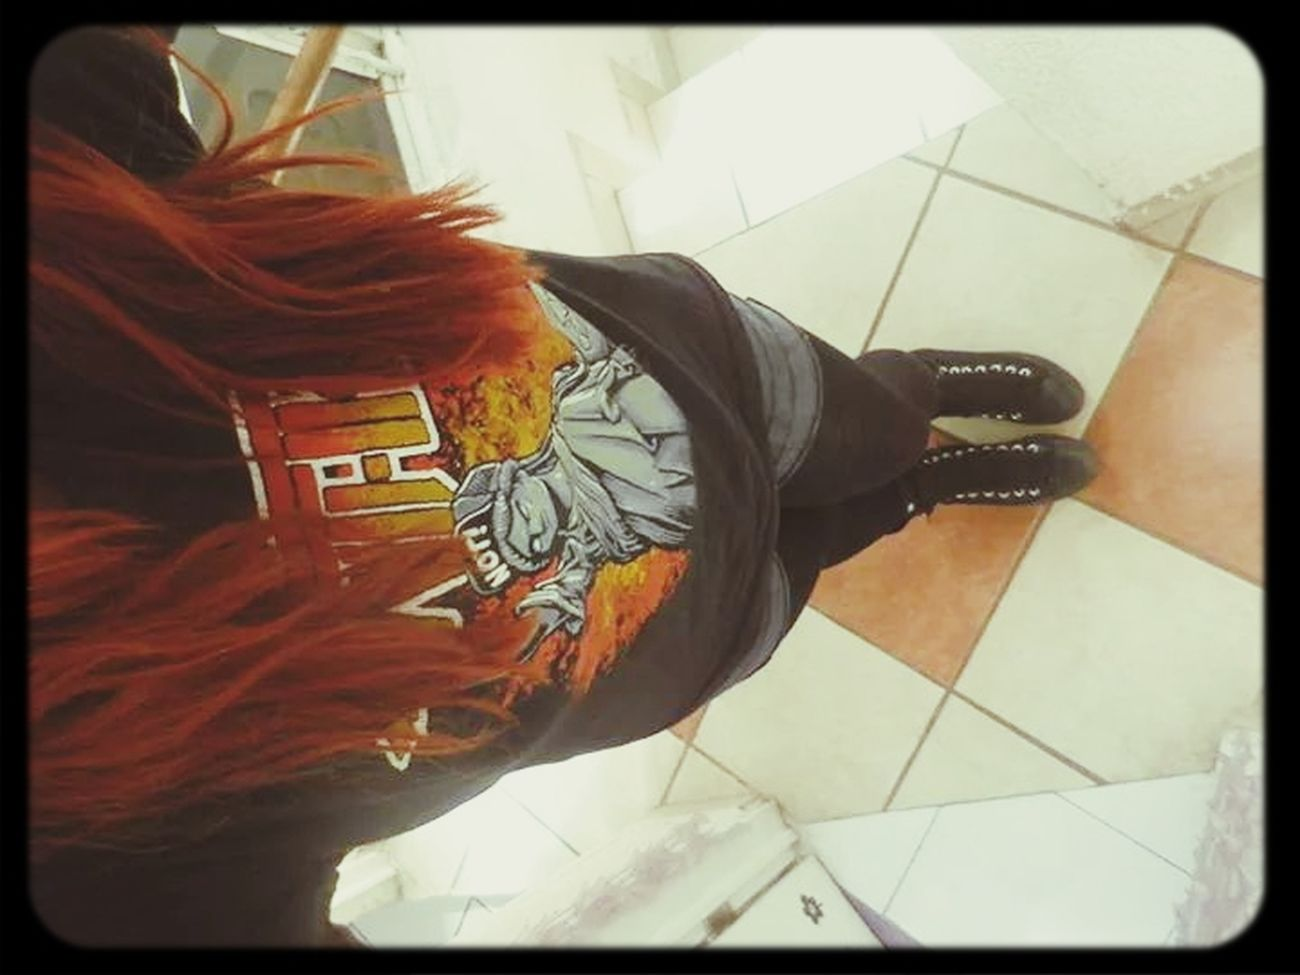 Anthrax Self Portrait